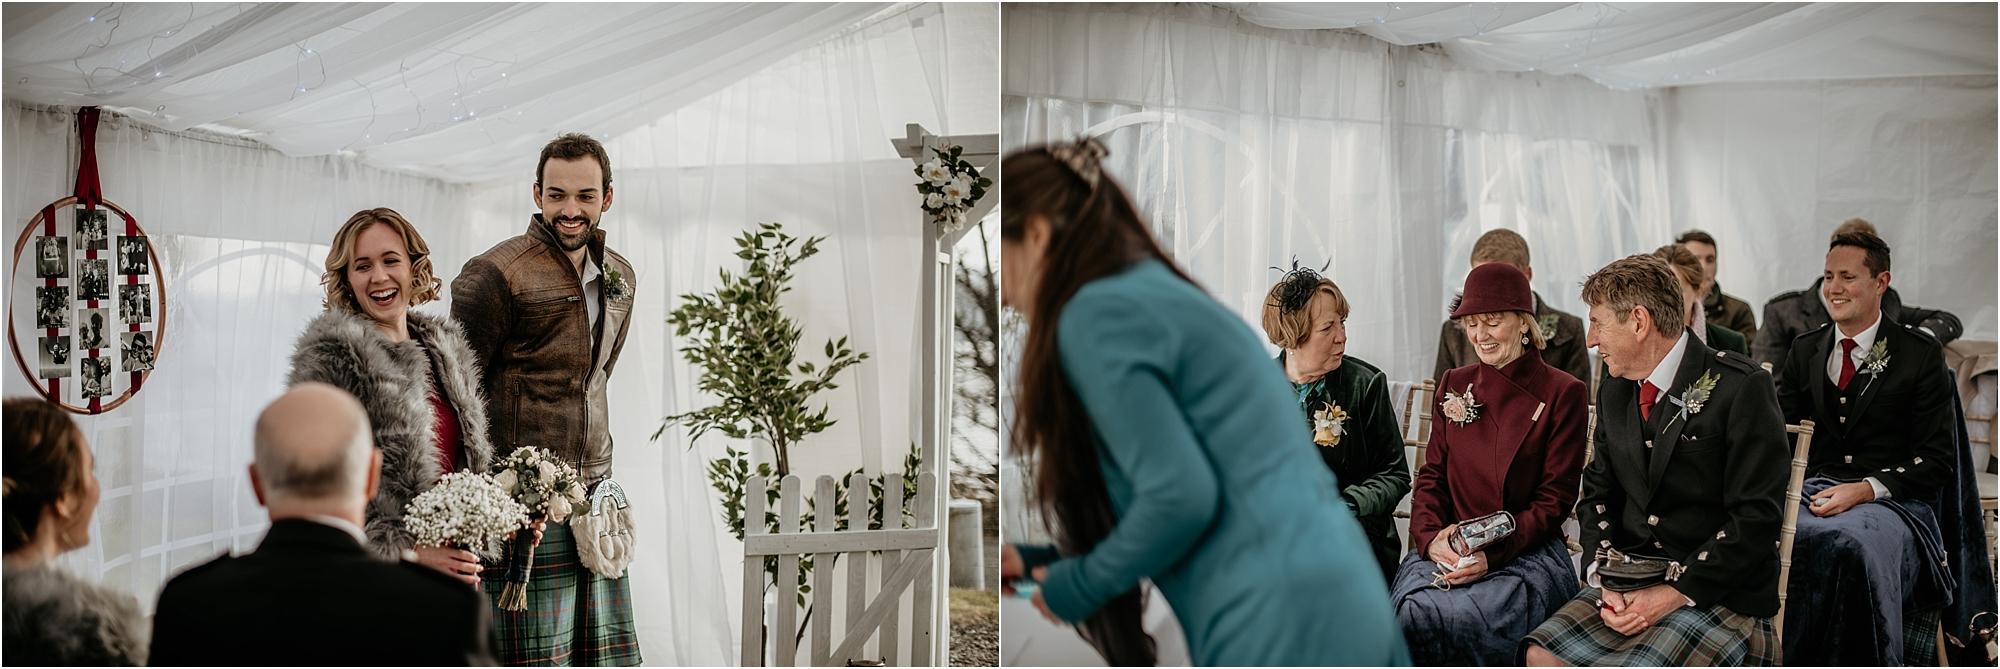 Kinlochard-village-hall-scottish-wedding-claire-fleck-photography__0031.jpg